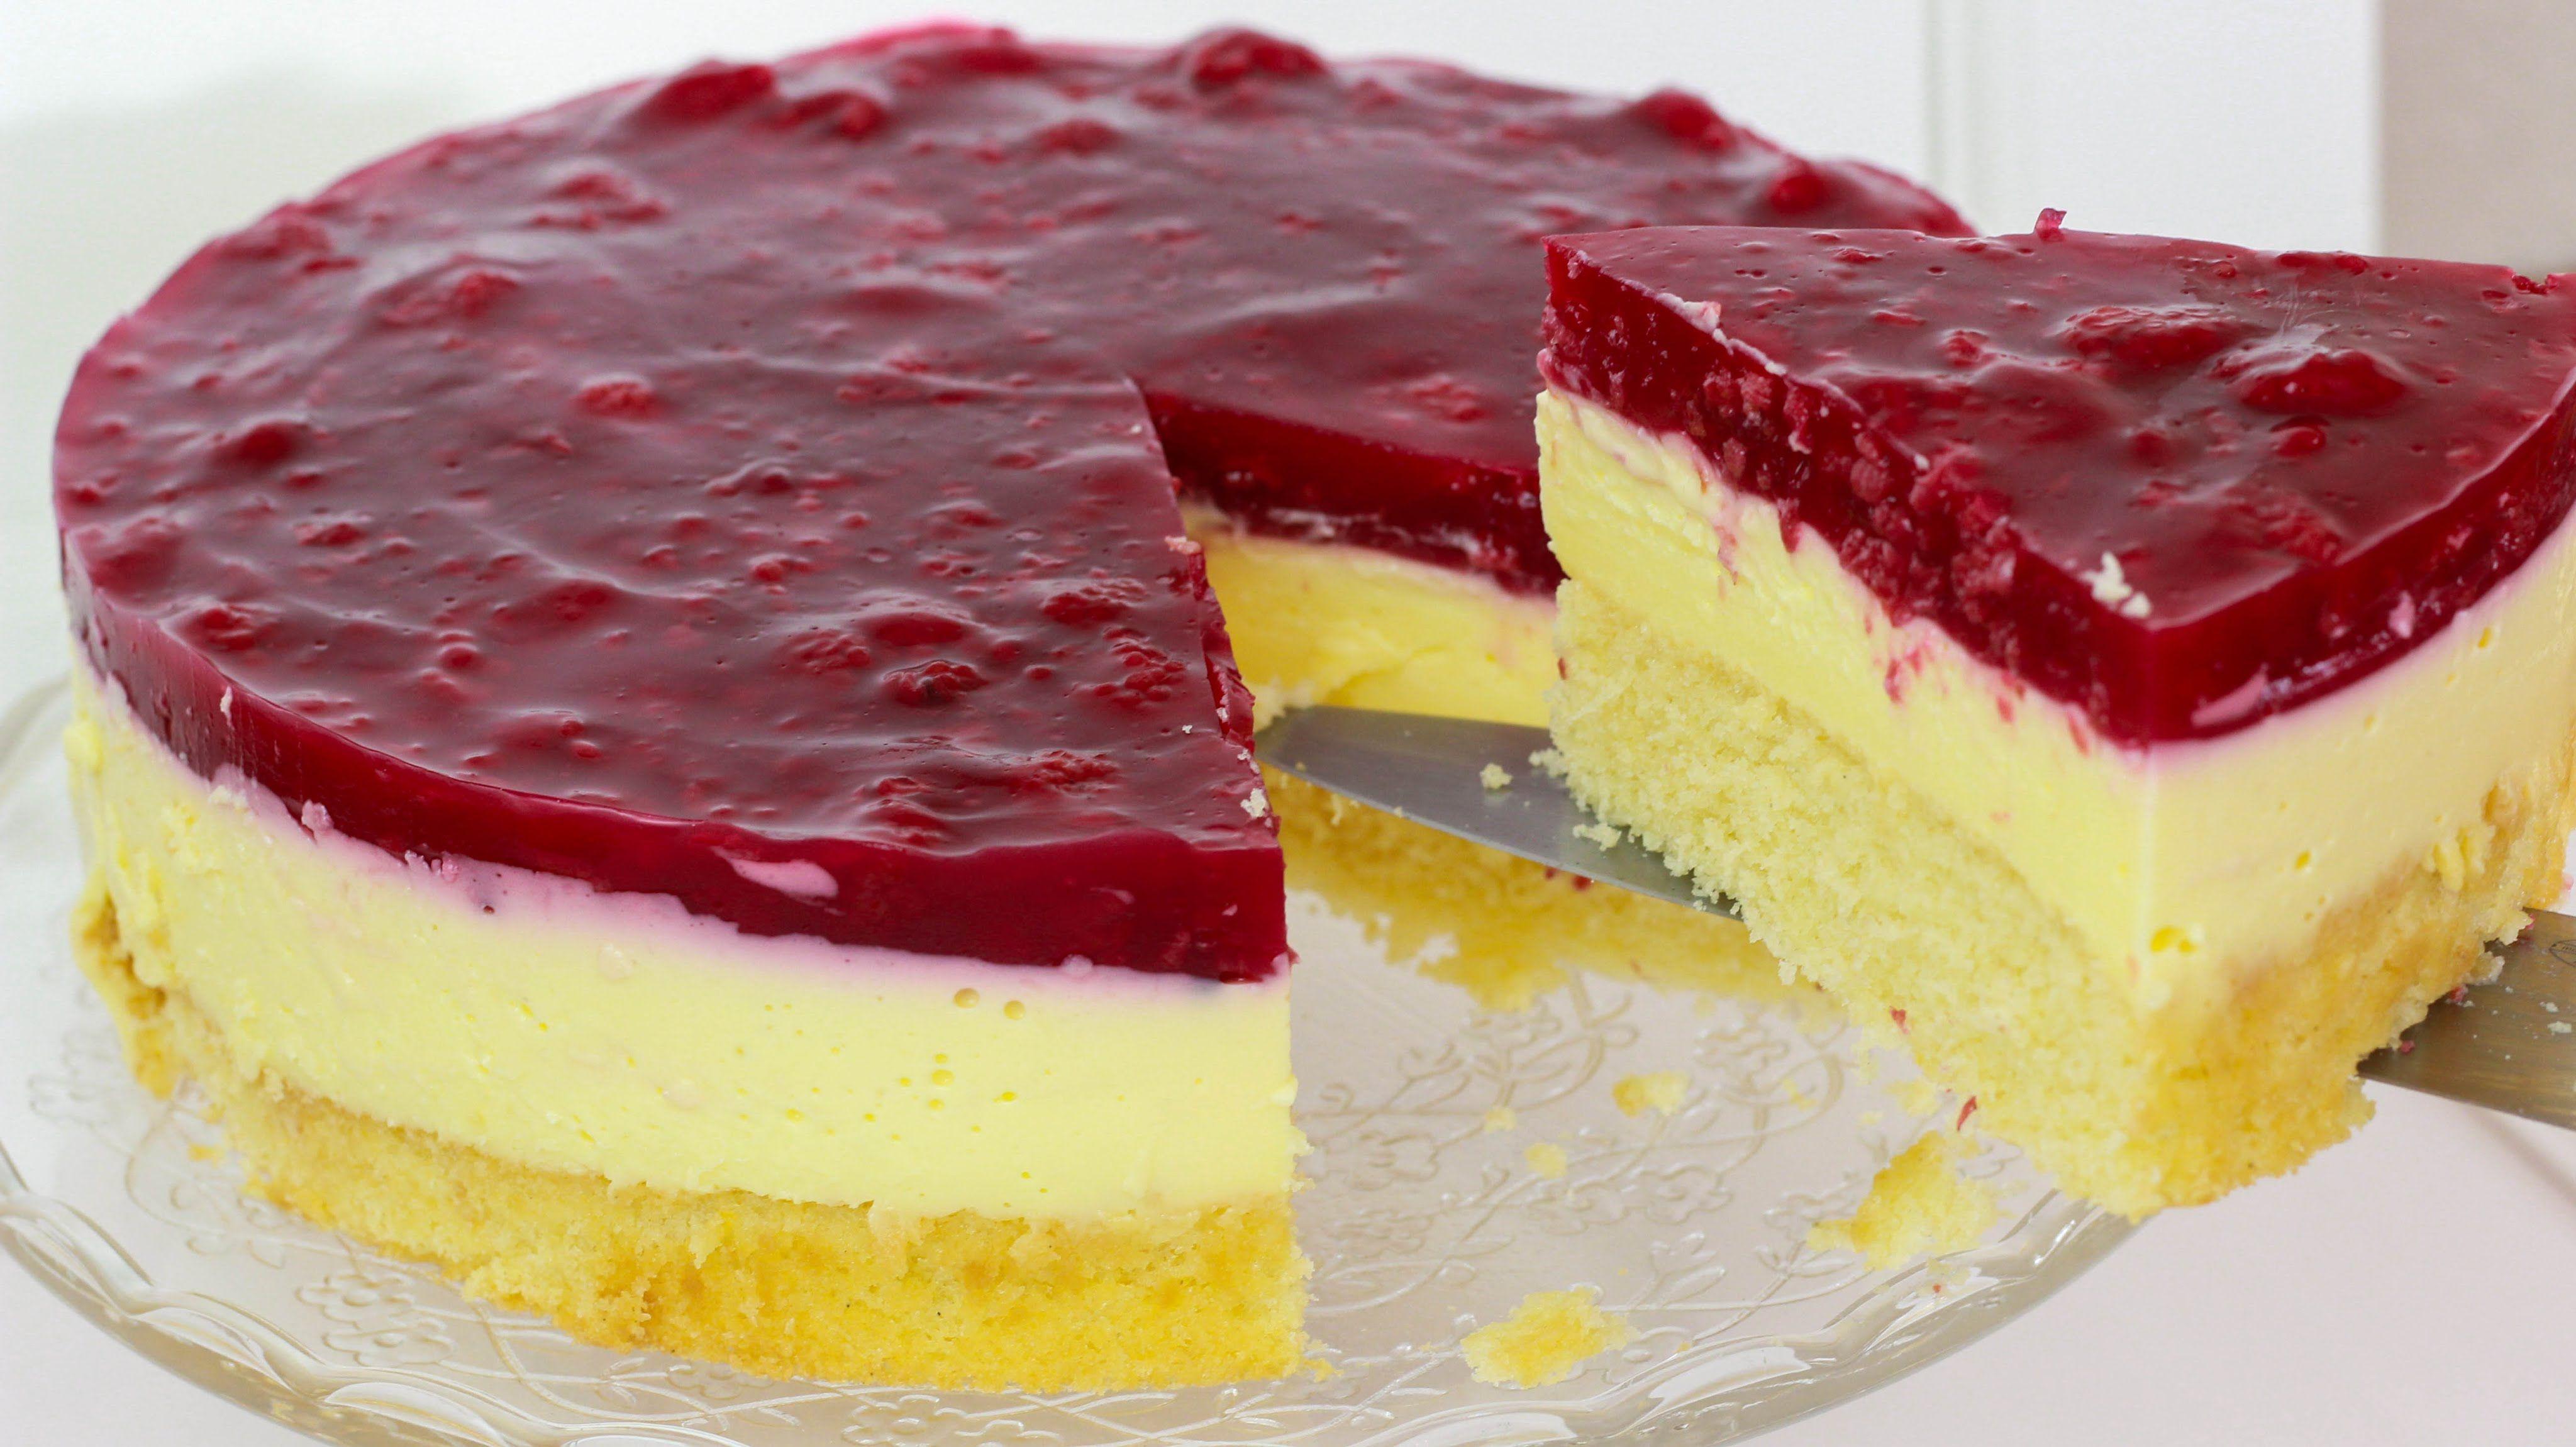 himbeer schmand kuchen schmandkuchen mit himbeeren schmand torte cake kuchen pinterest. Black Bedroom Furniture Sets. Home Design Ideas